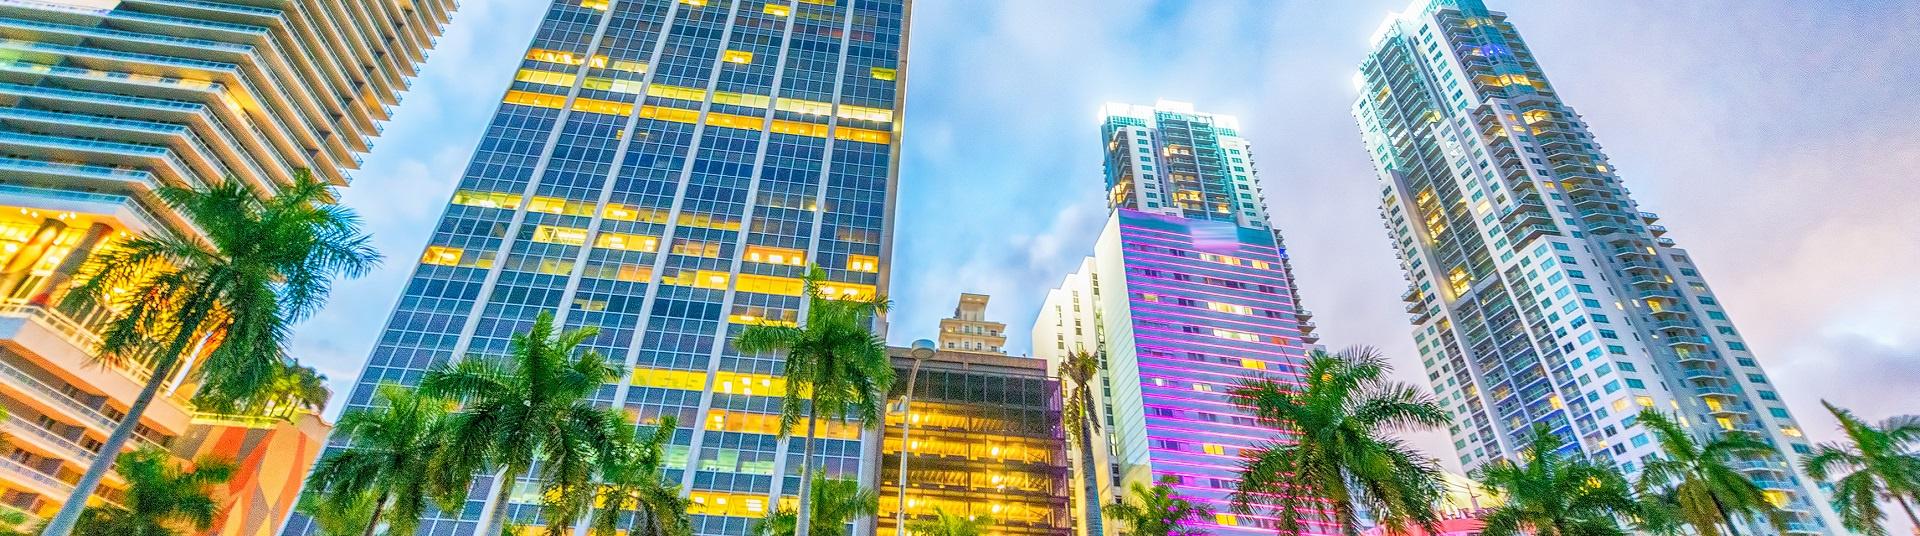 Week-end pas cher Miami